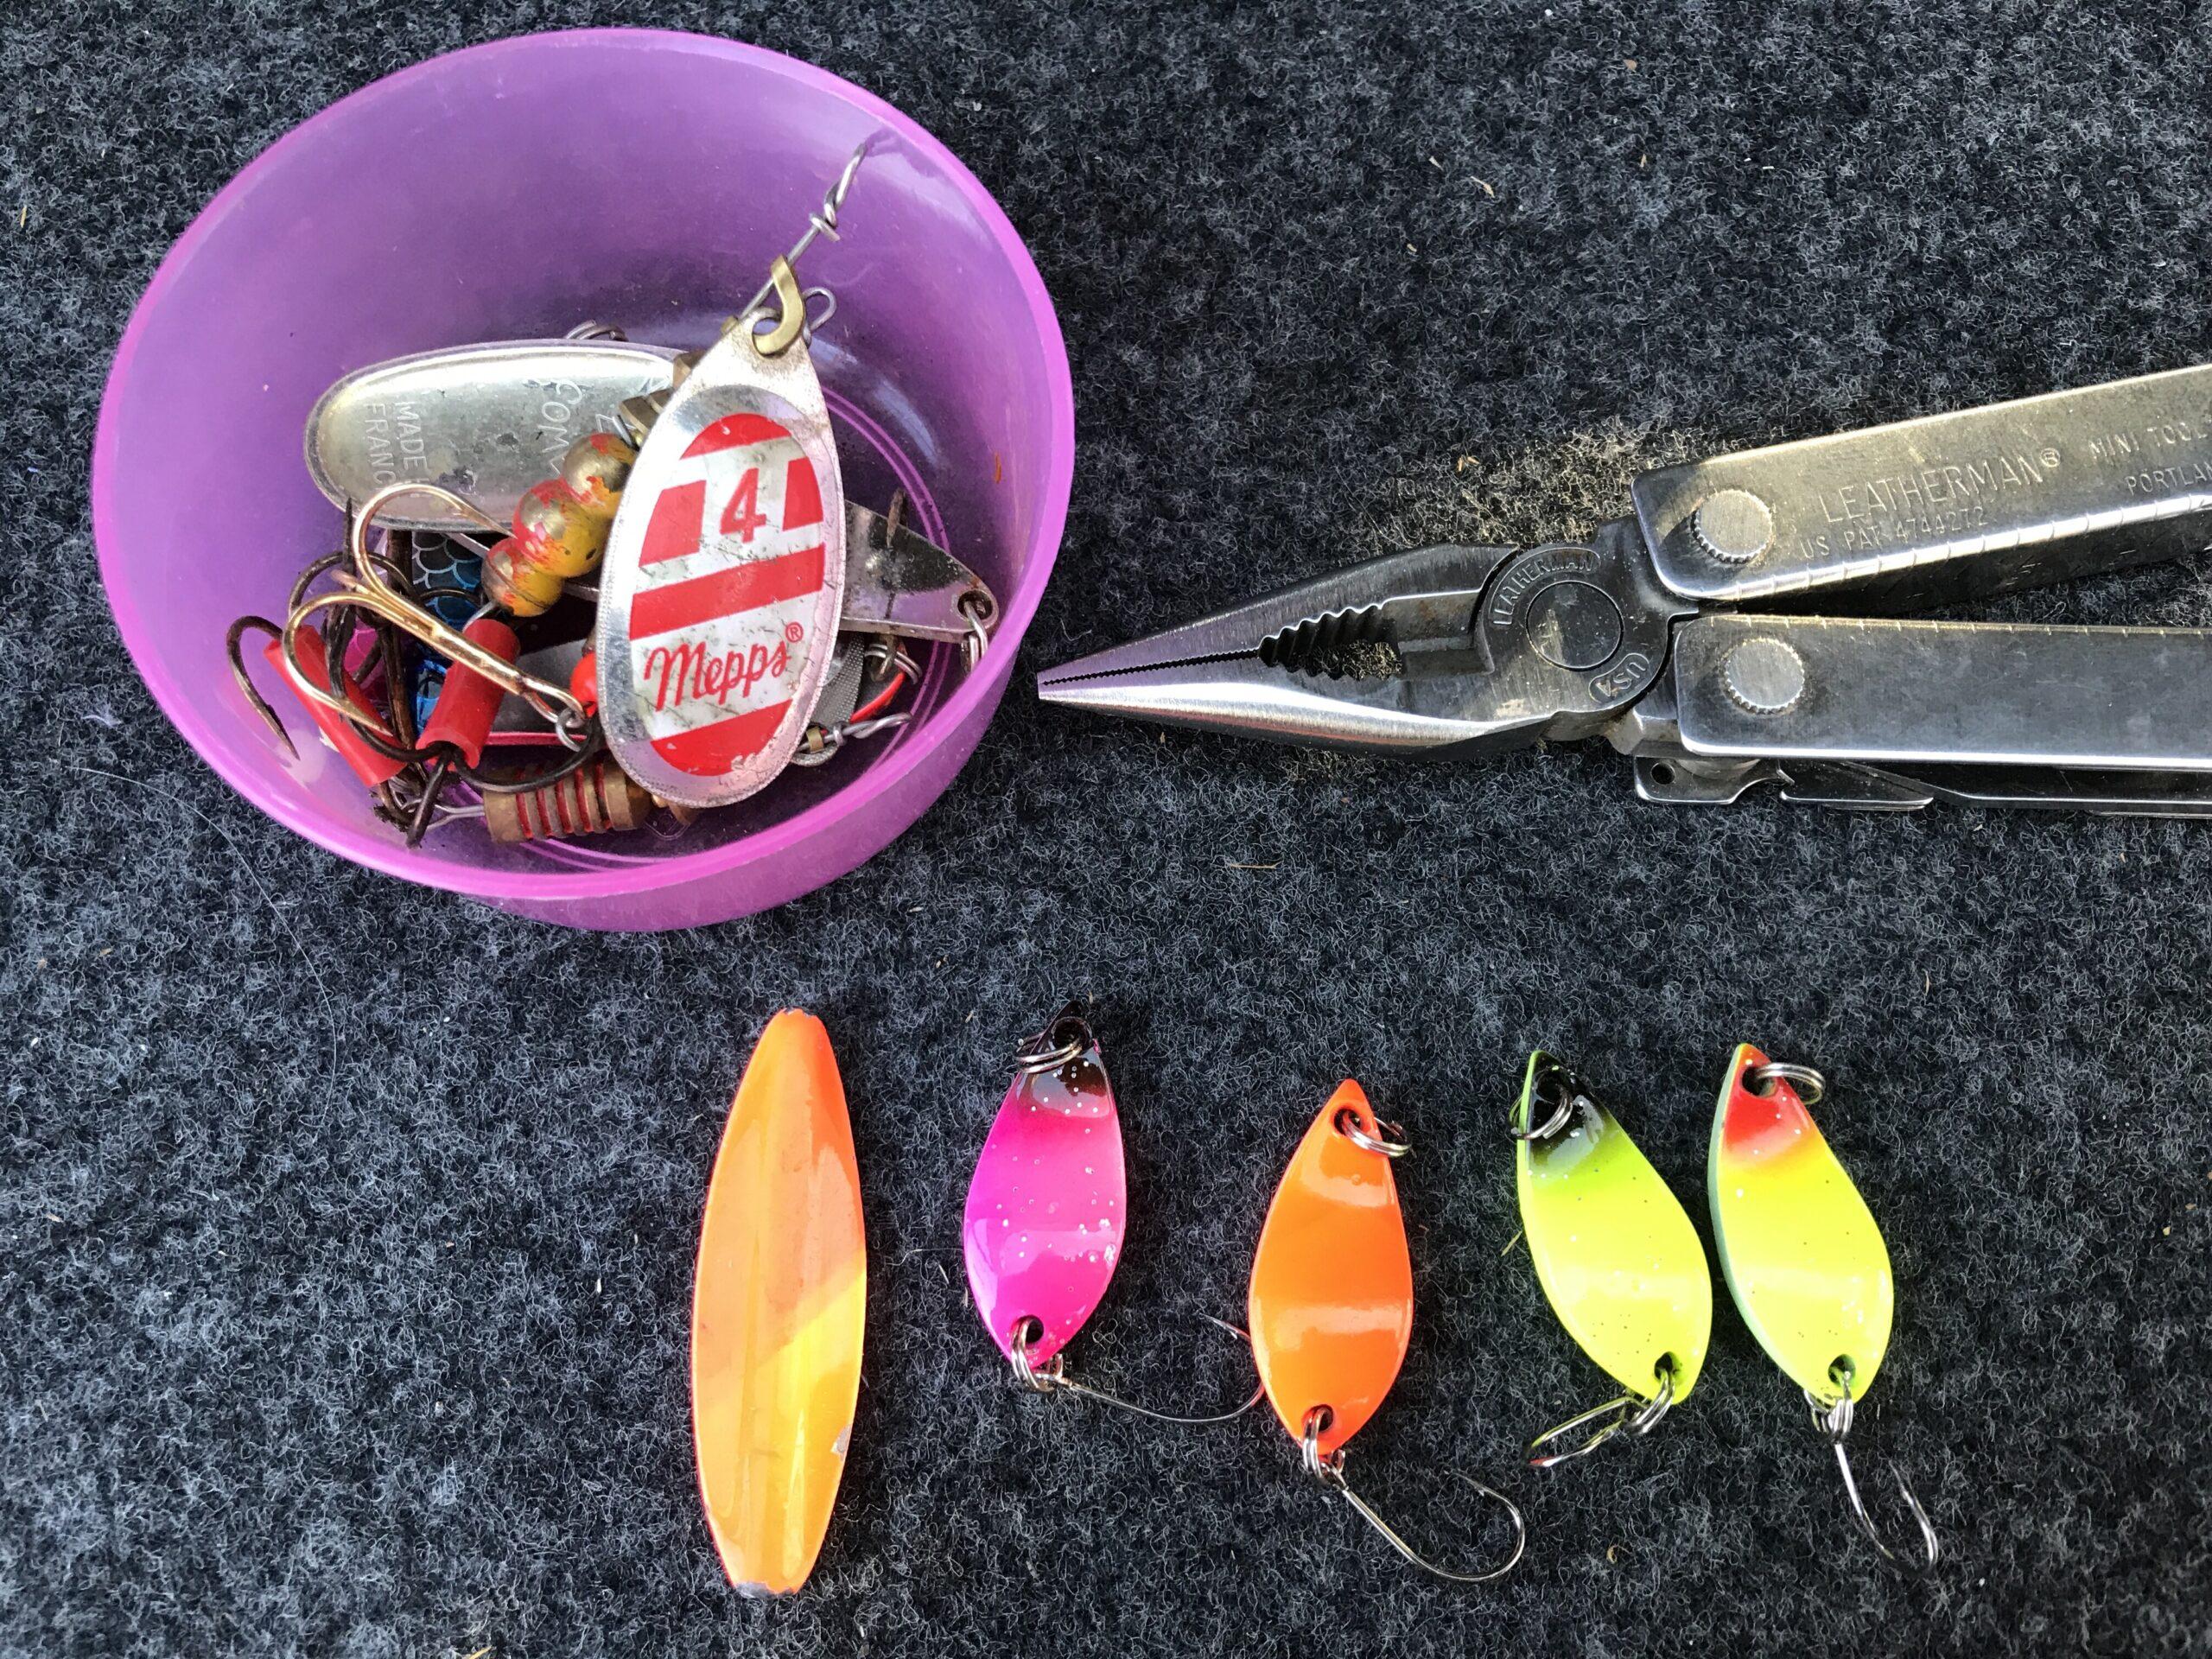 Mjøls Lystfiskeri: De fanger dem på blink